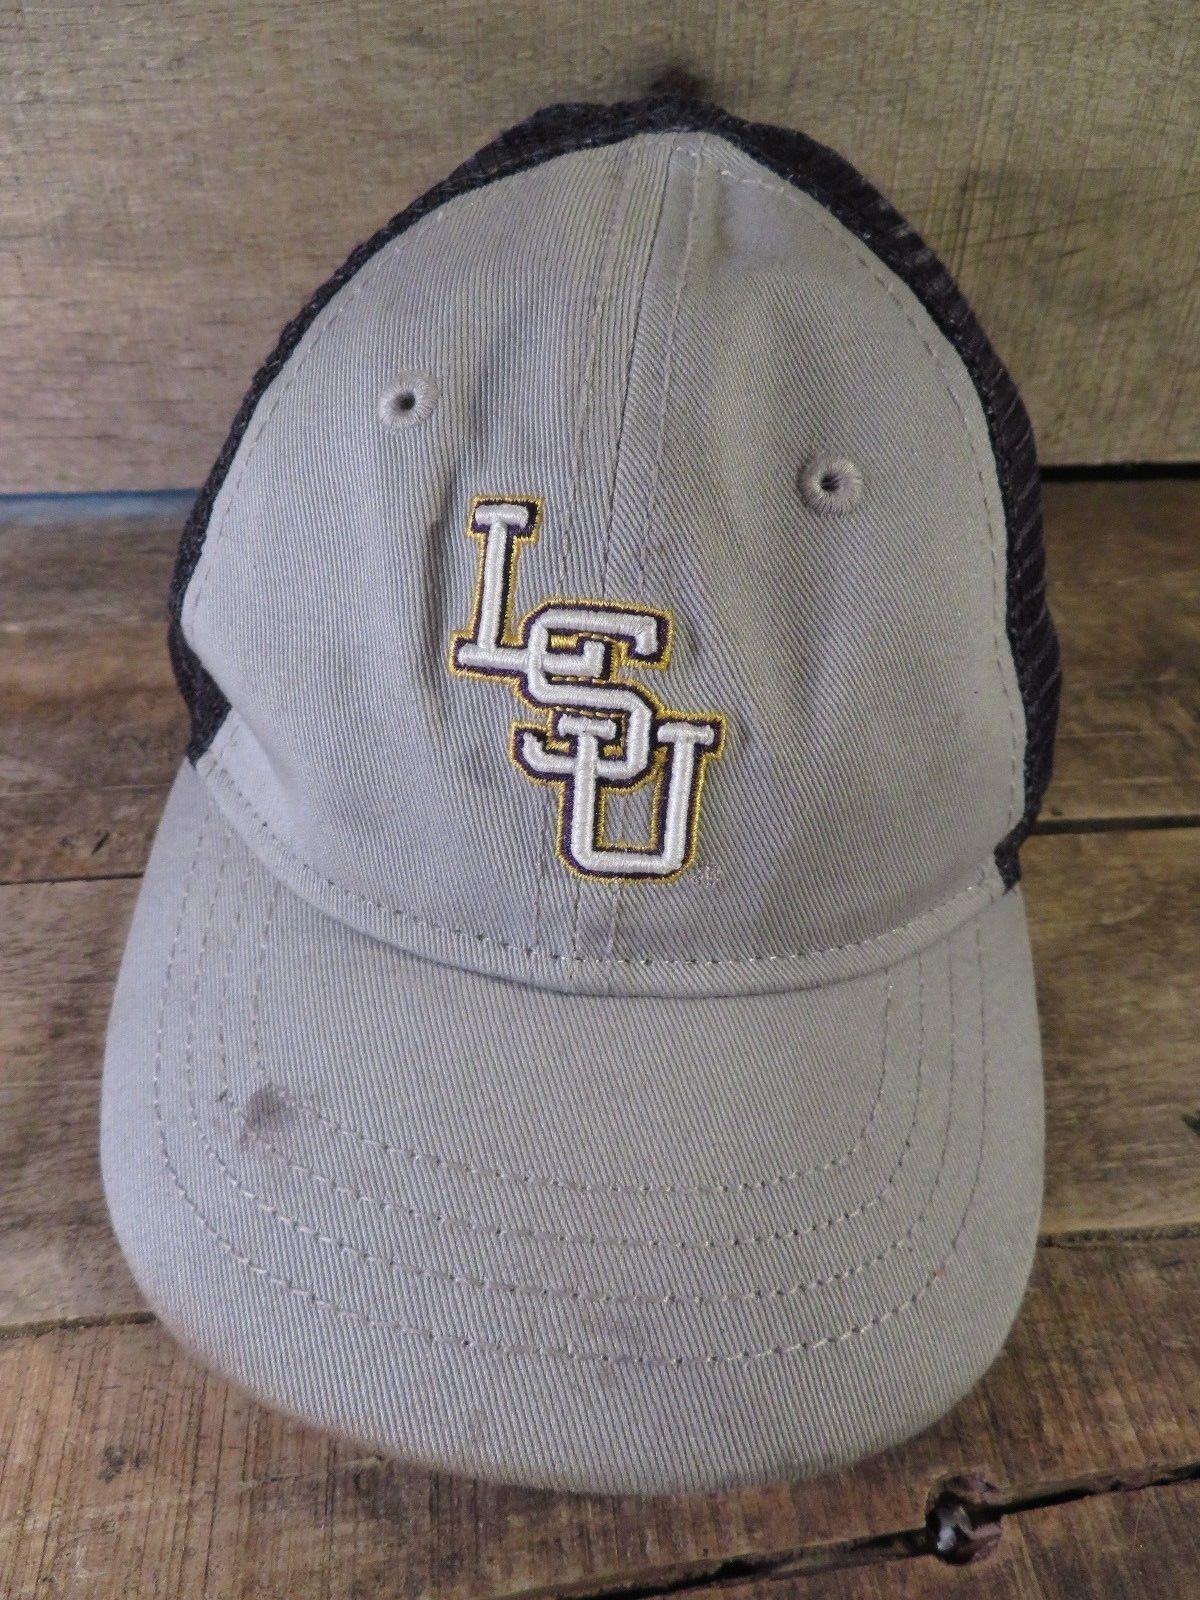 Lsu Louisiana State Universidad New Era Bebés Niños Gorra